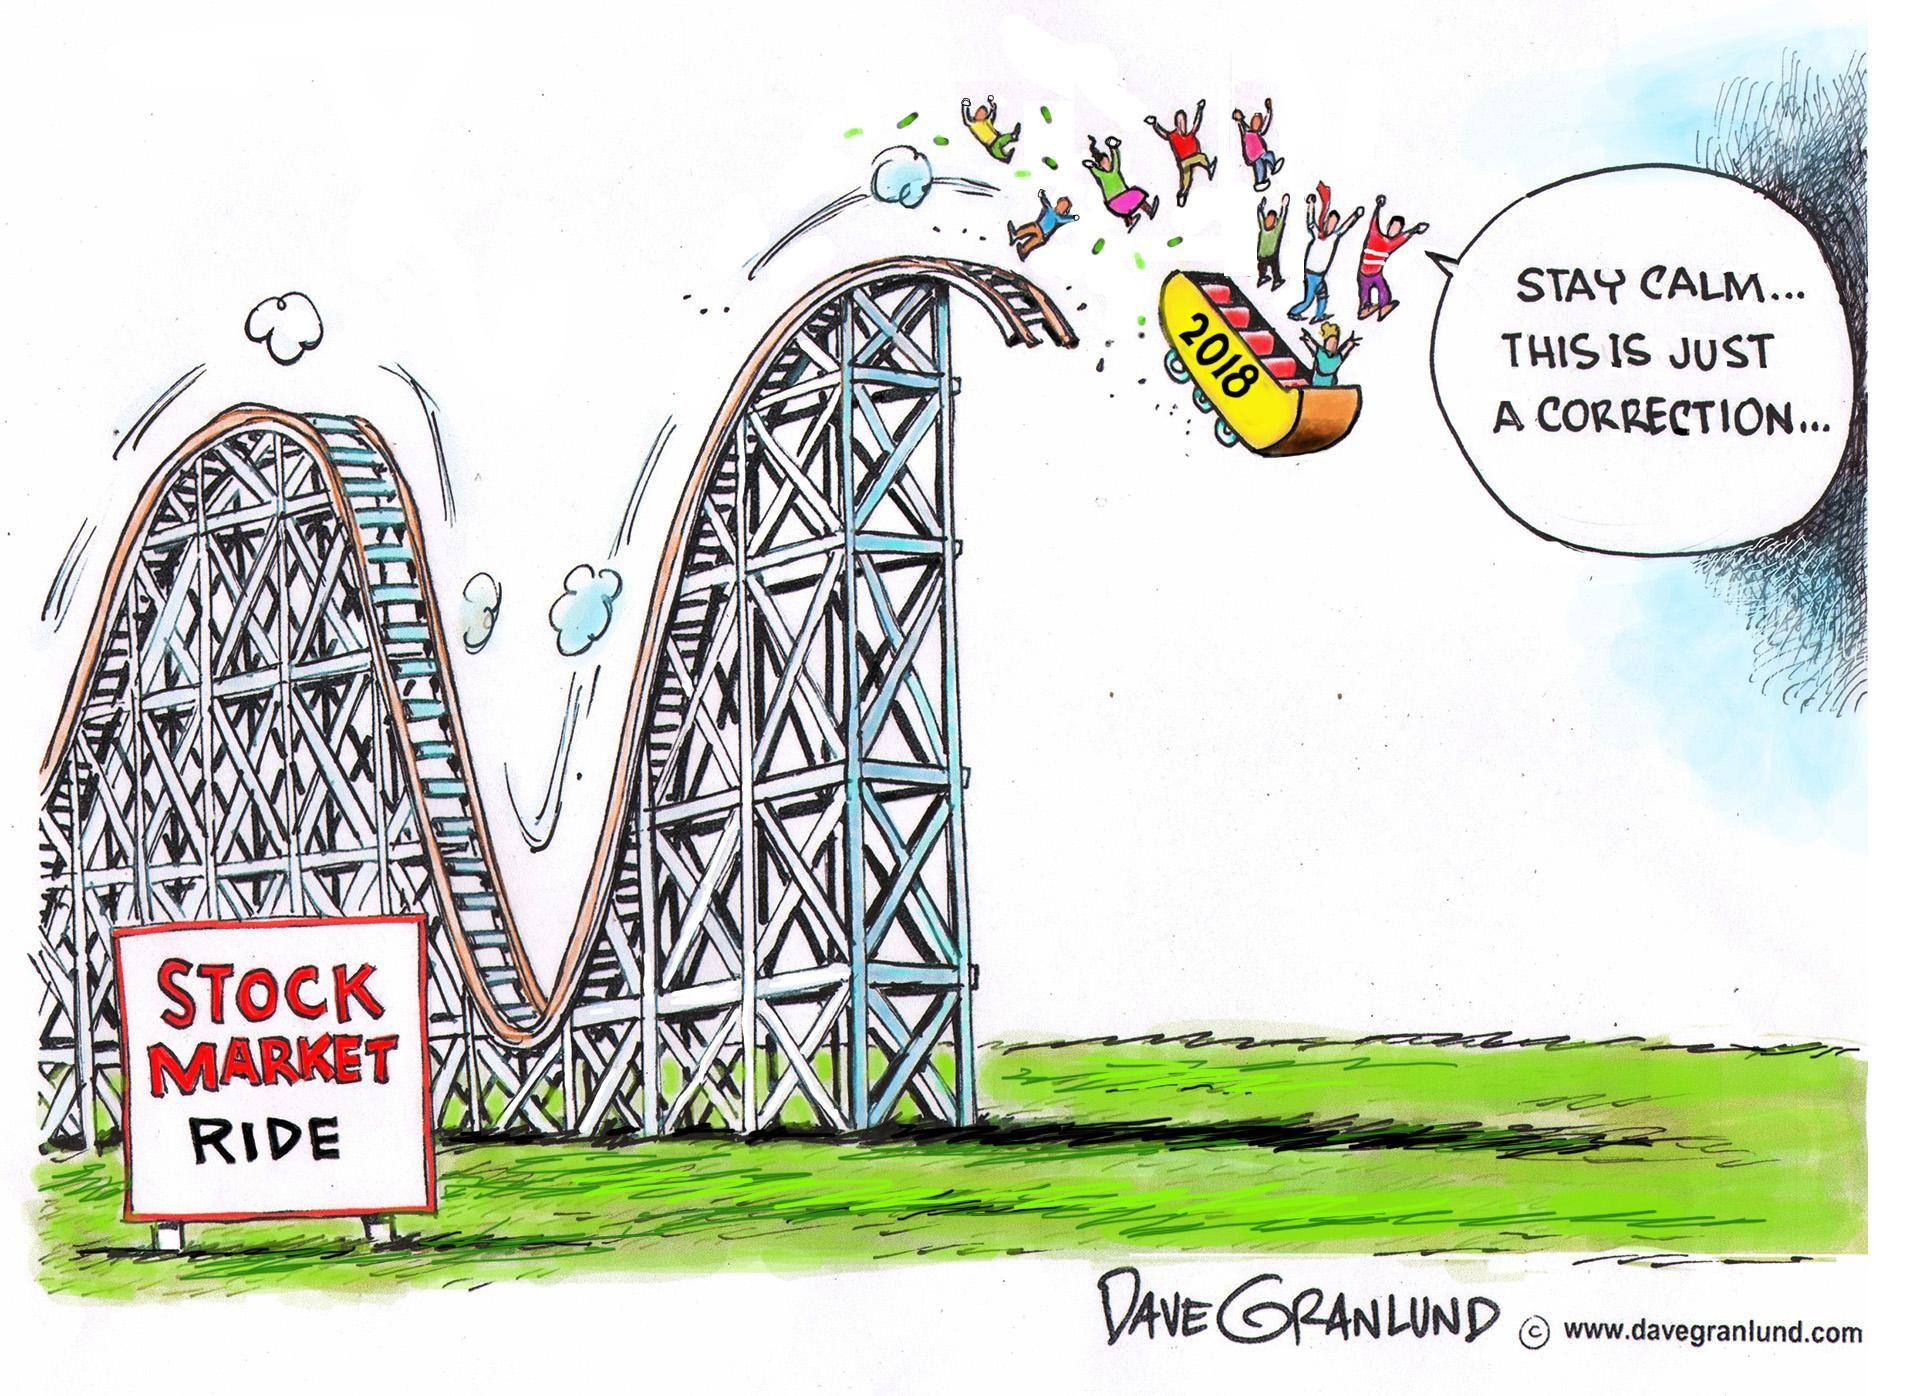 Dave Granlund Cartoon On The Stock Market Editorial Cartoon Recent Political Cartoons Stock Market